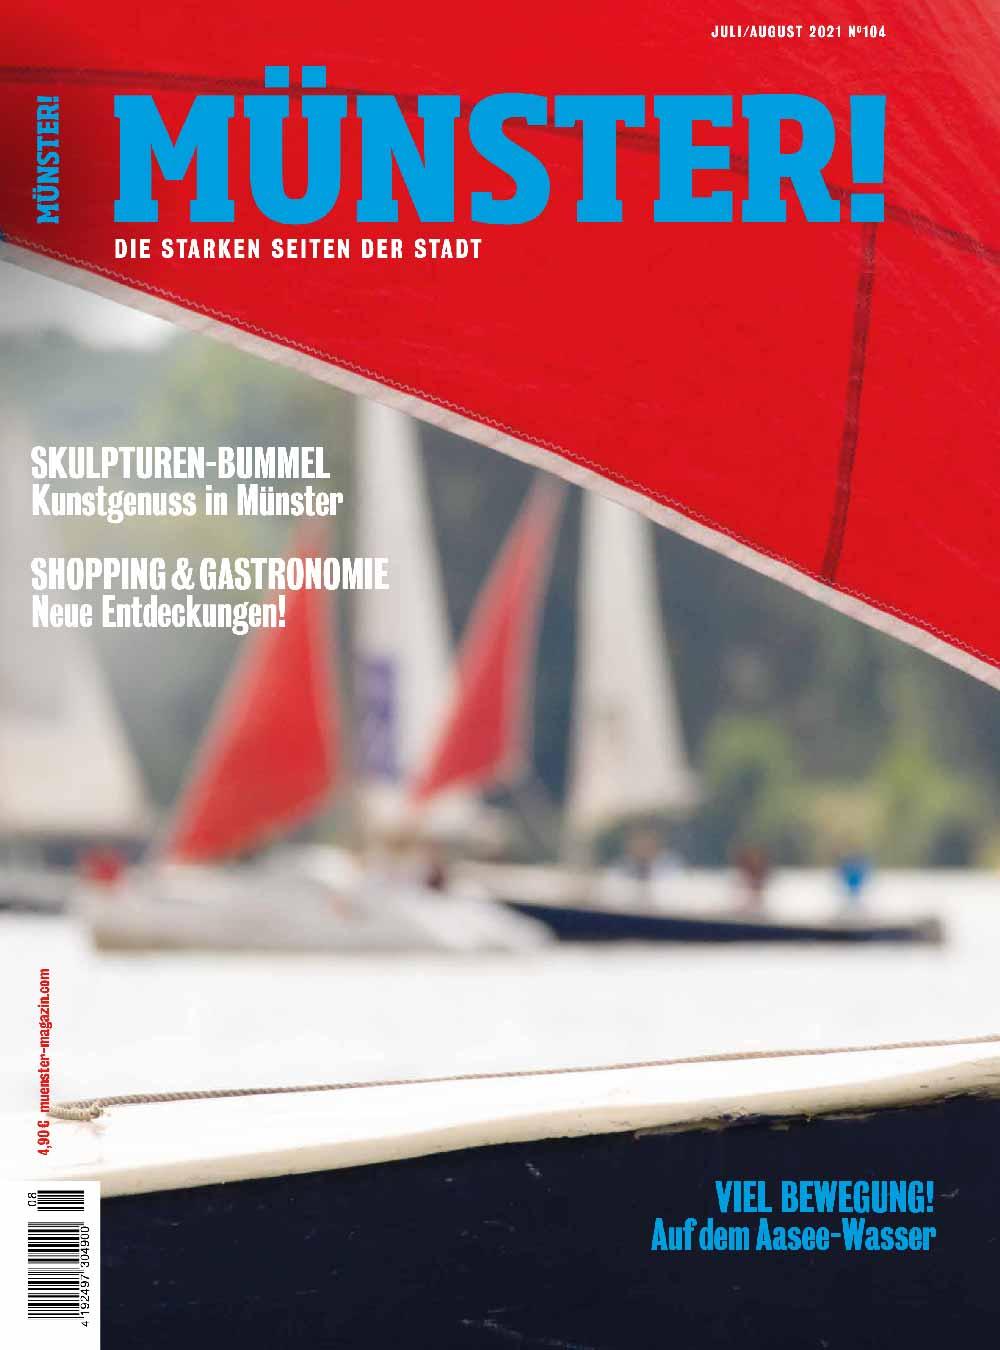 Münster! Magazin 104 Titel